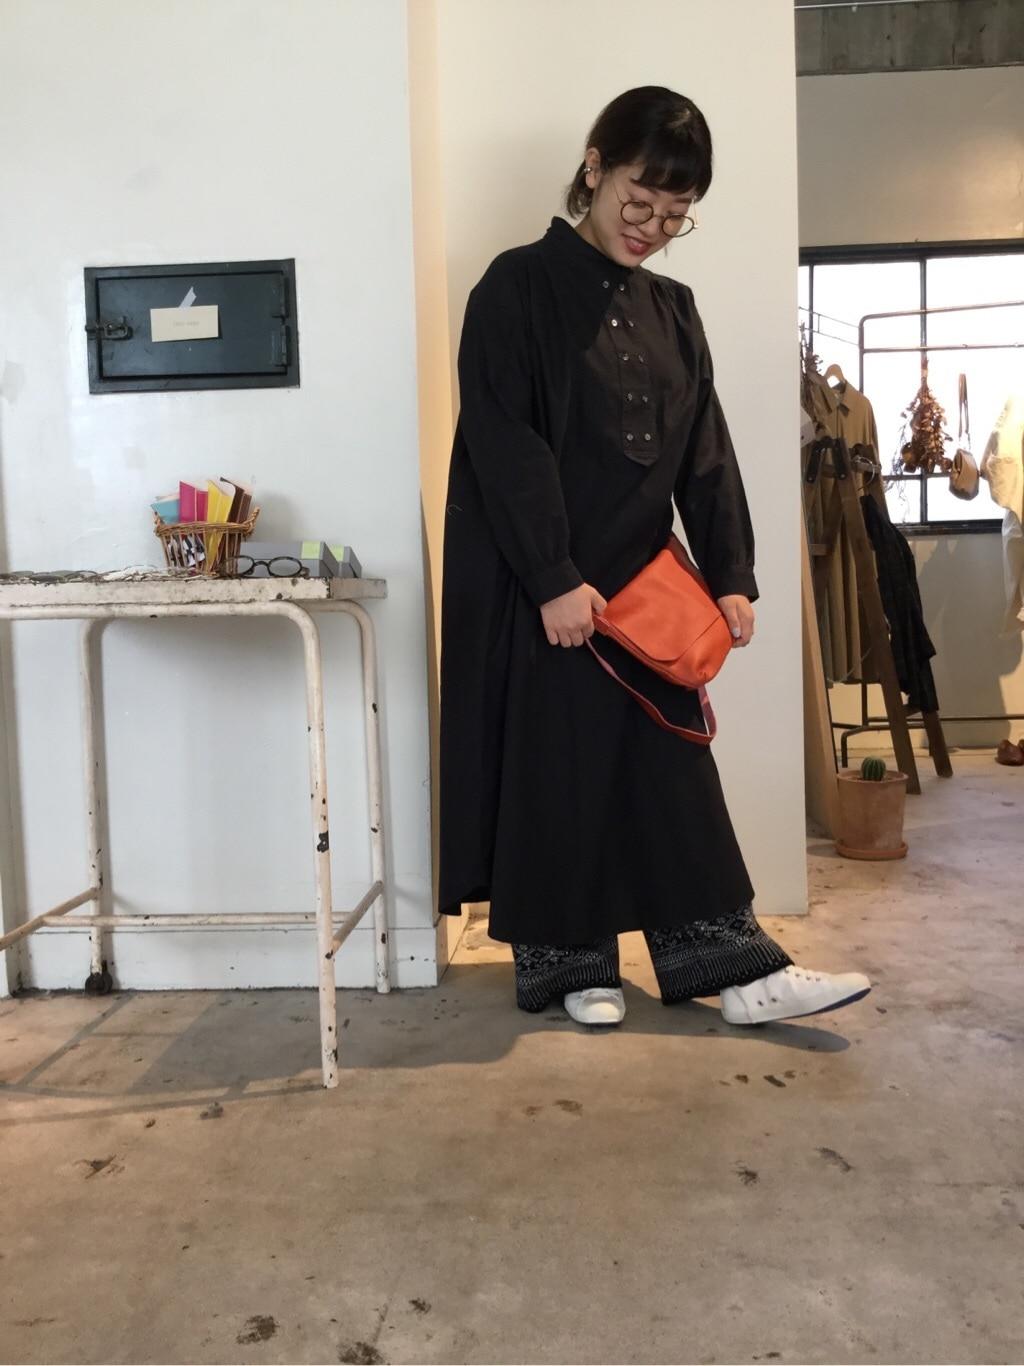 108 yuni / bulle de savon 福岡薬院路面 身長:150cm 2019.09.18